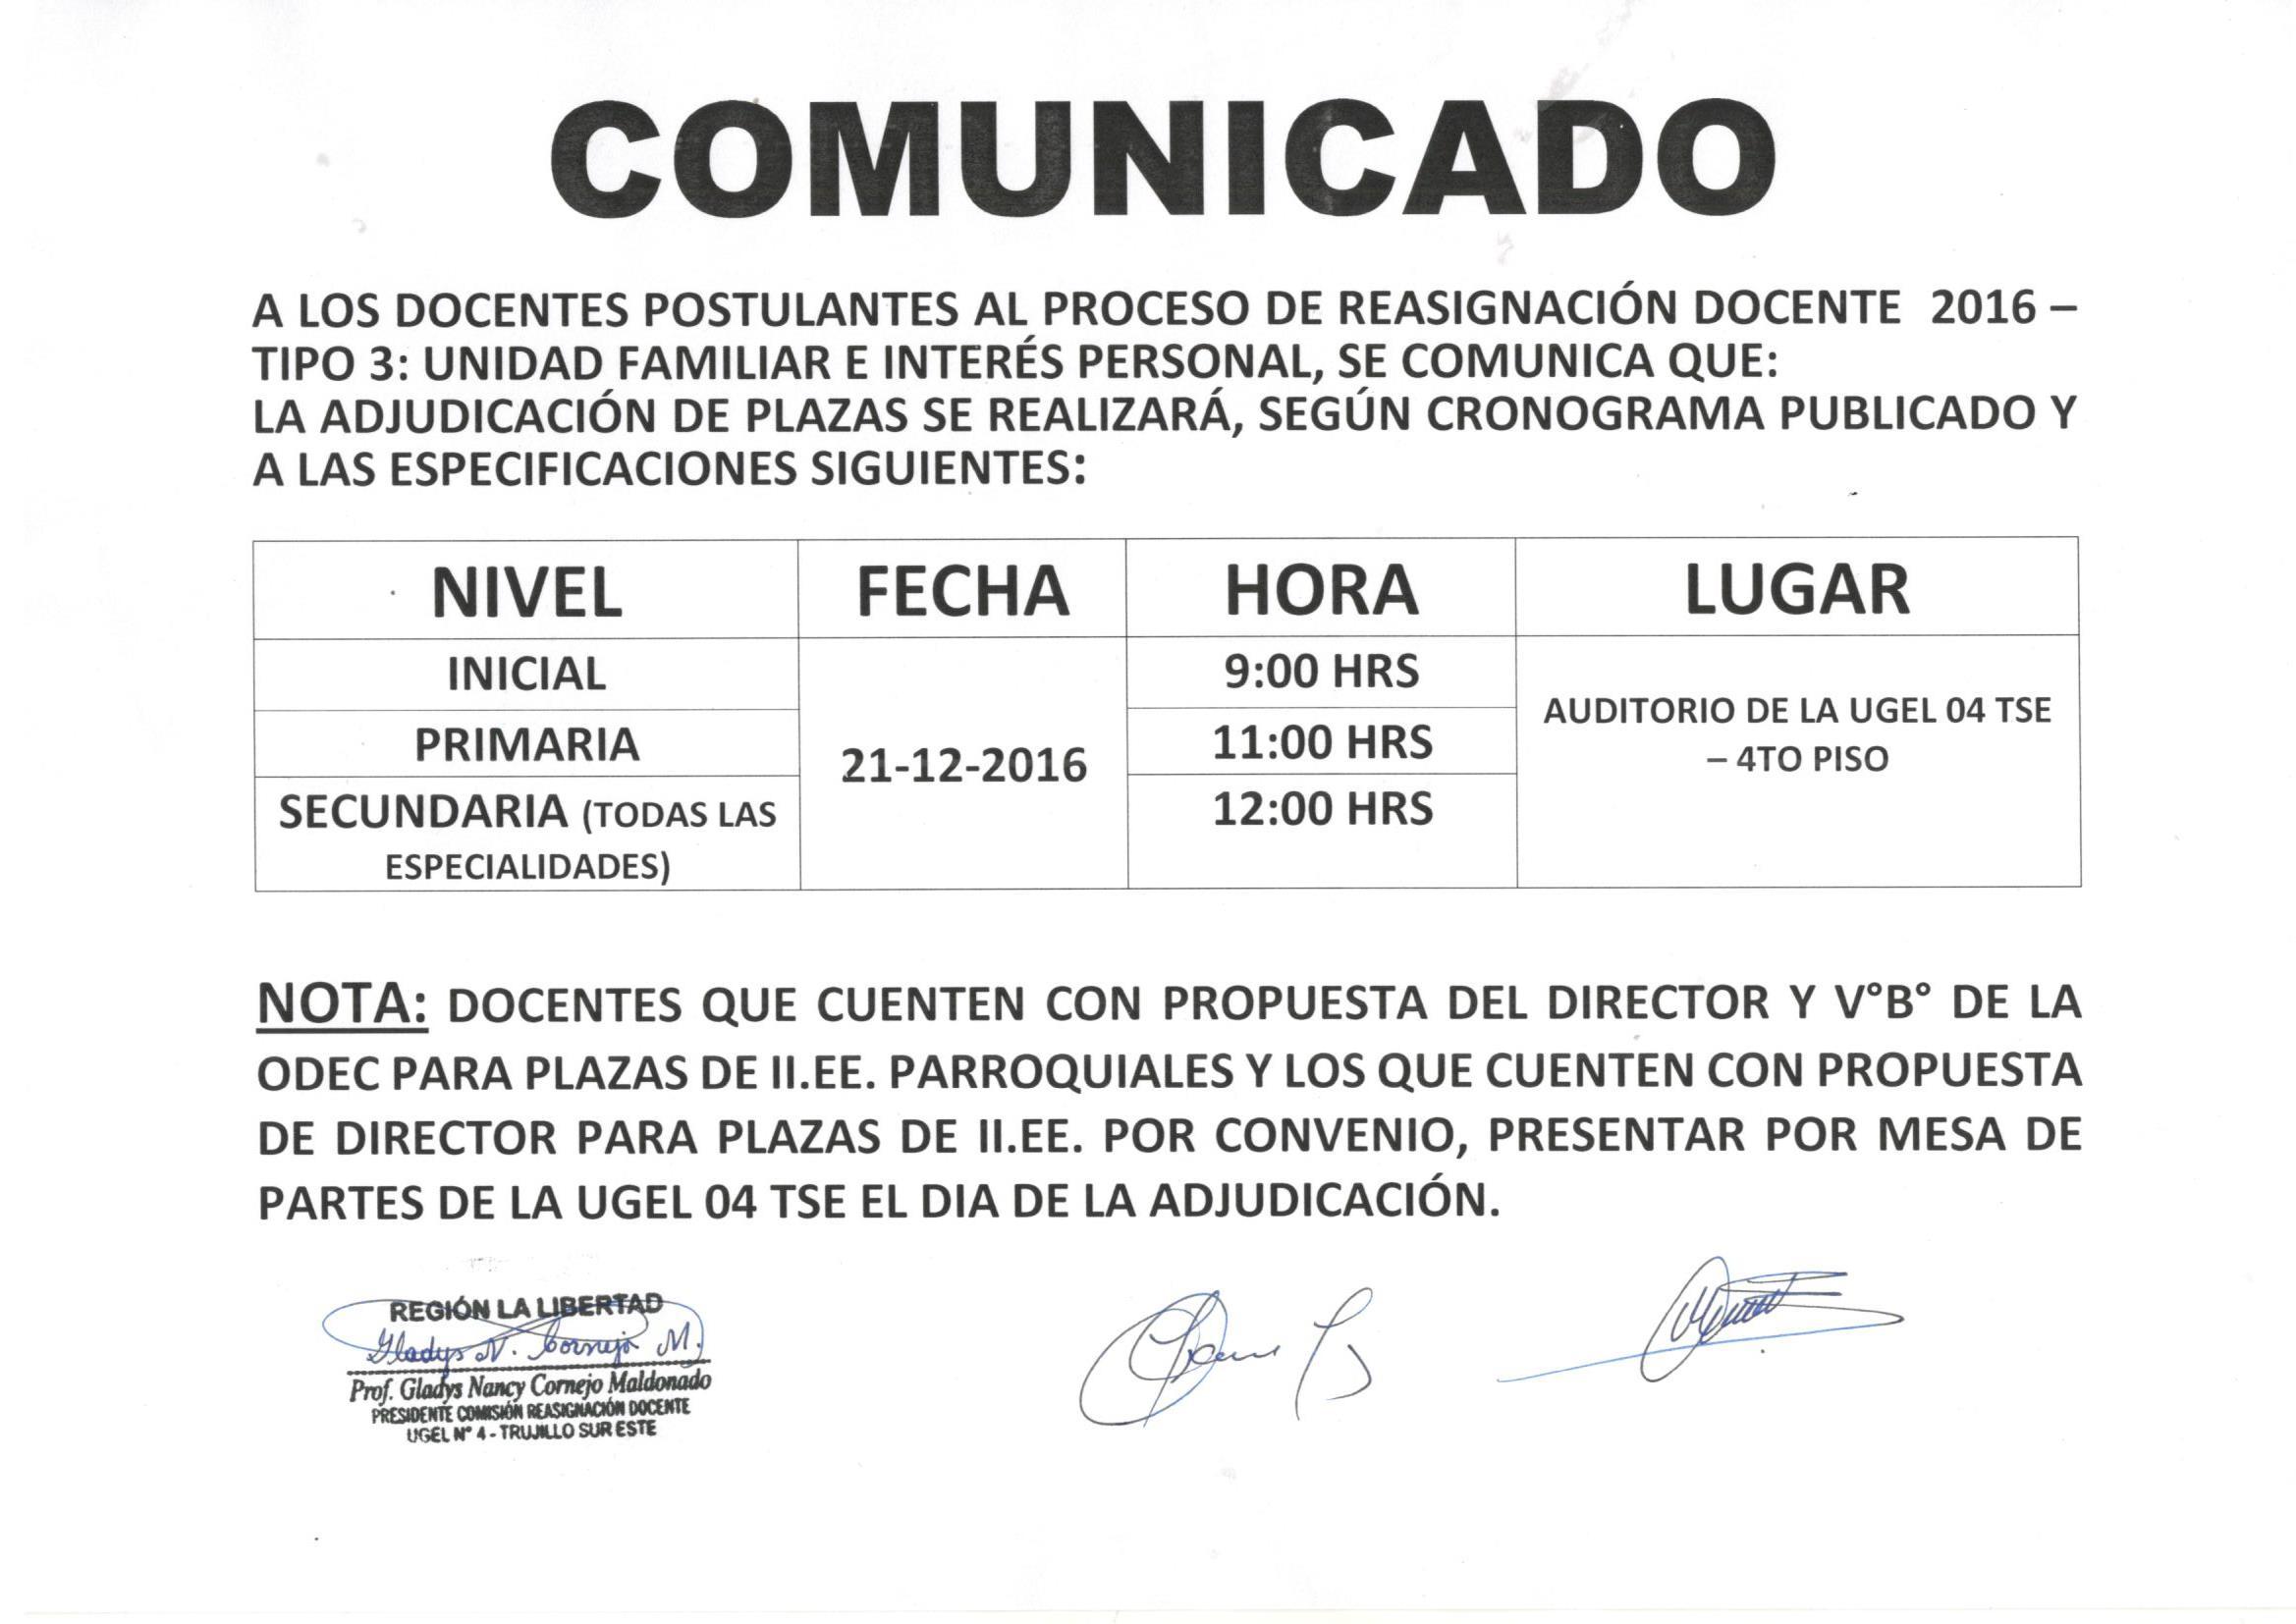 Comunicado reprogramaci n de adjudicaci n de plazas for Plazas de docentes 2016